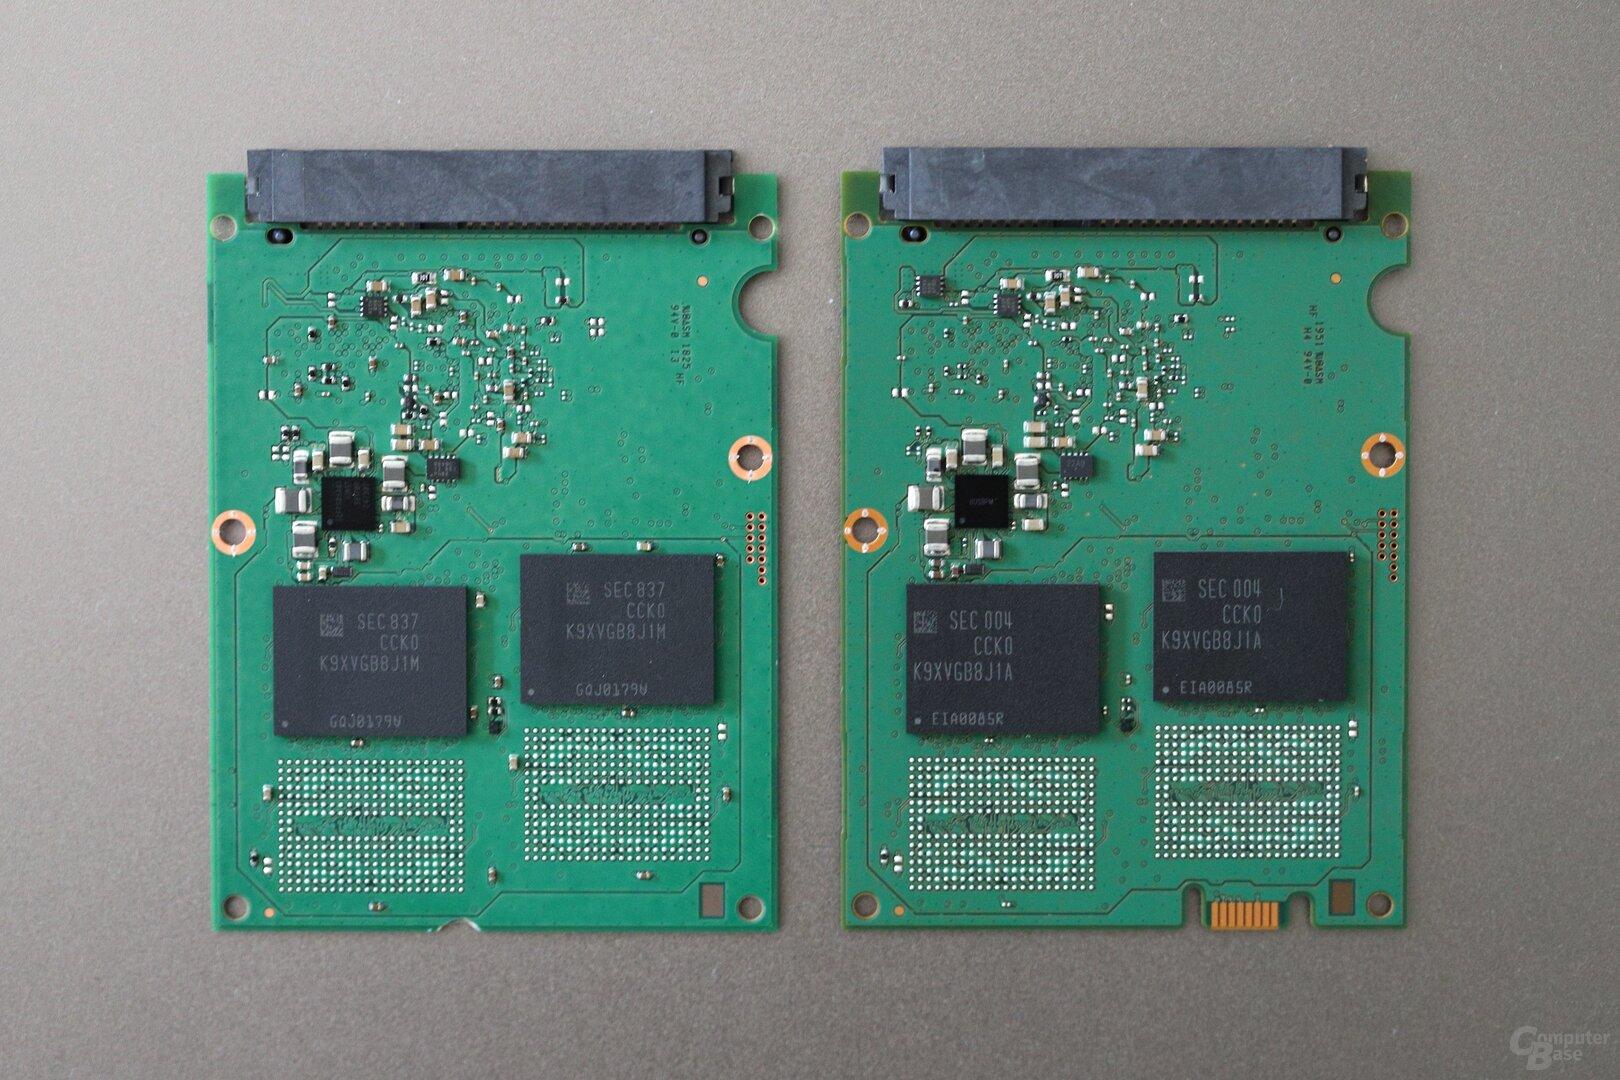 Links das PCB der 860 QVO 4 TB, rechts der 870 QVO 4 TB (Rückseite)